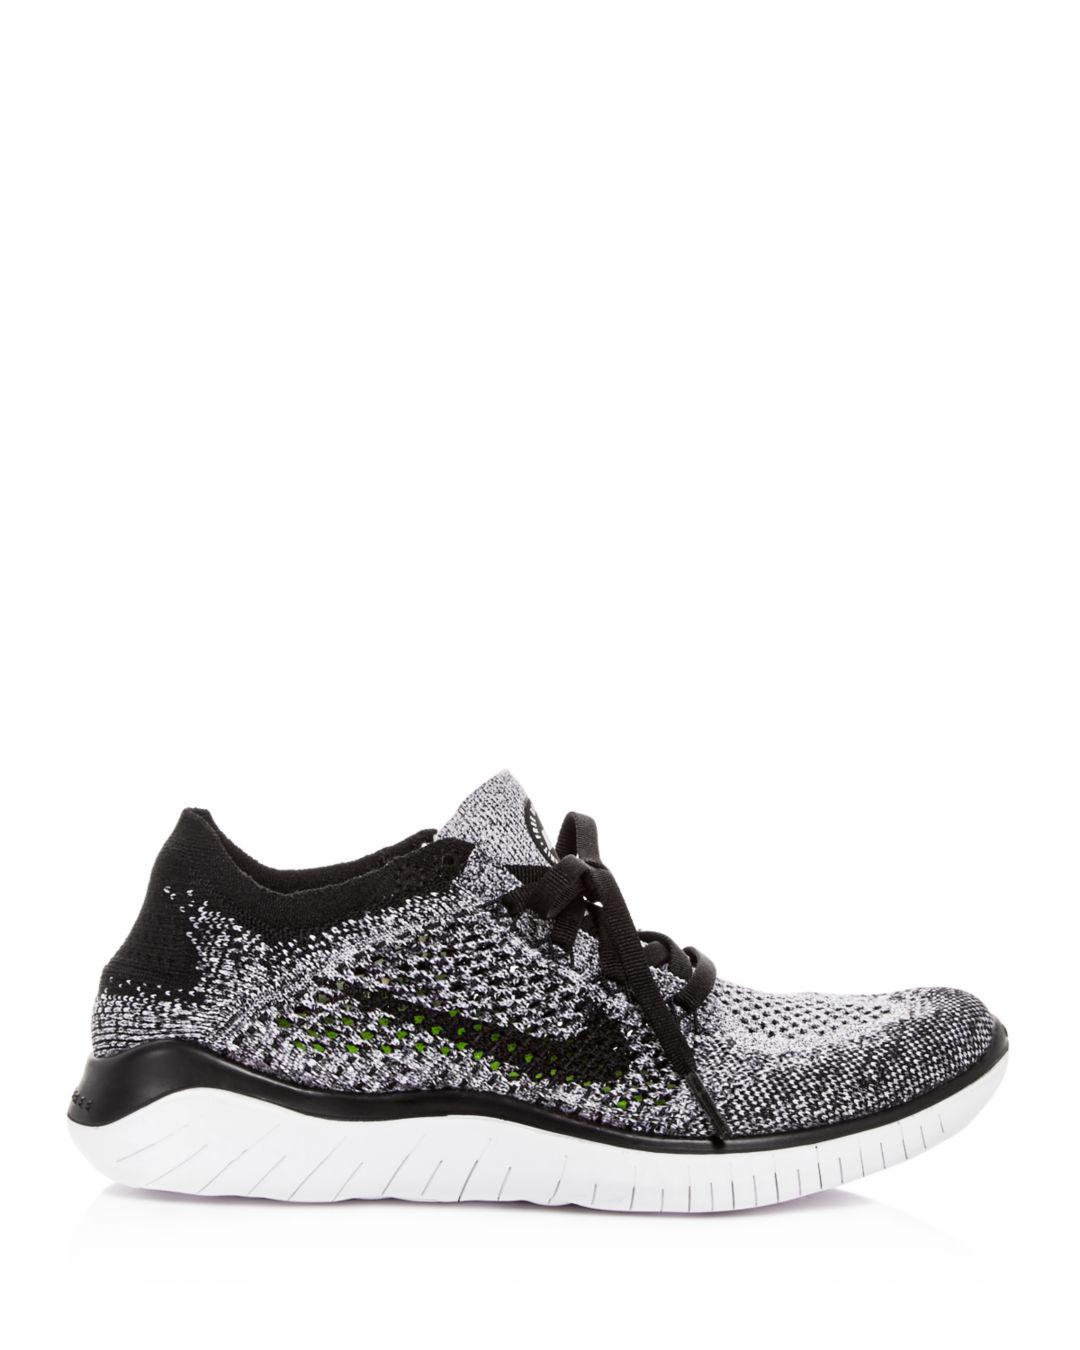 12da24aa9aee Lyst - Nike Women s Free Rn Flyknit 2018 Lace Up Sneakers in Black - Save  25%